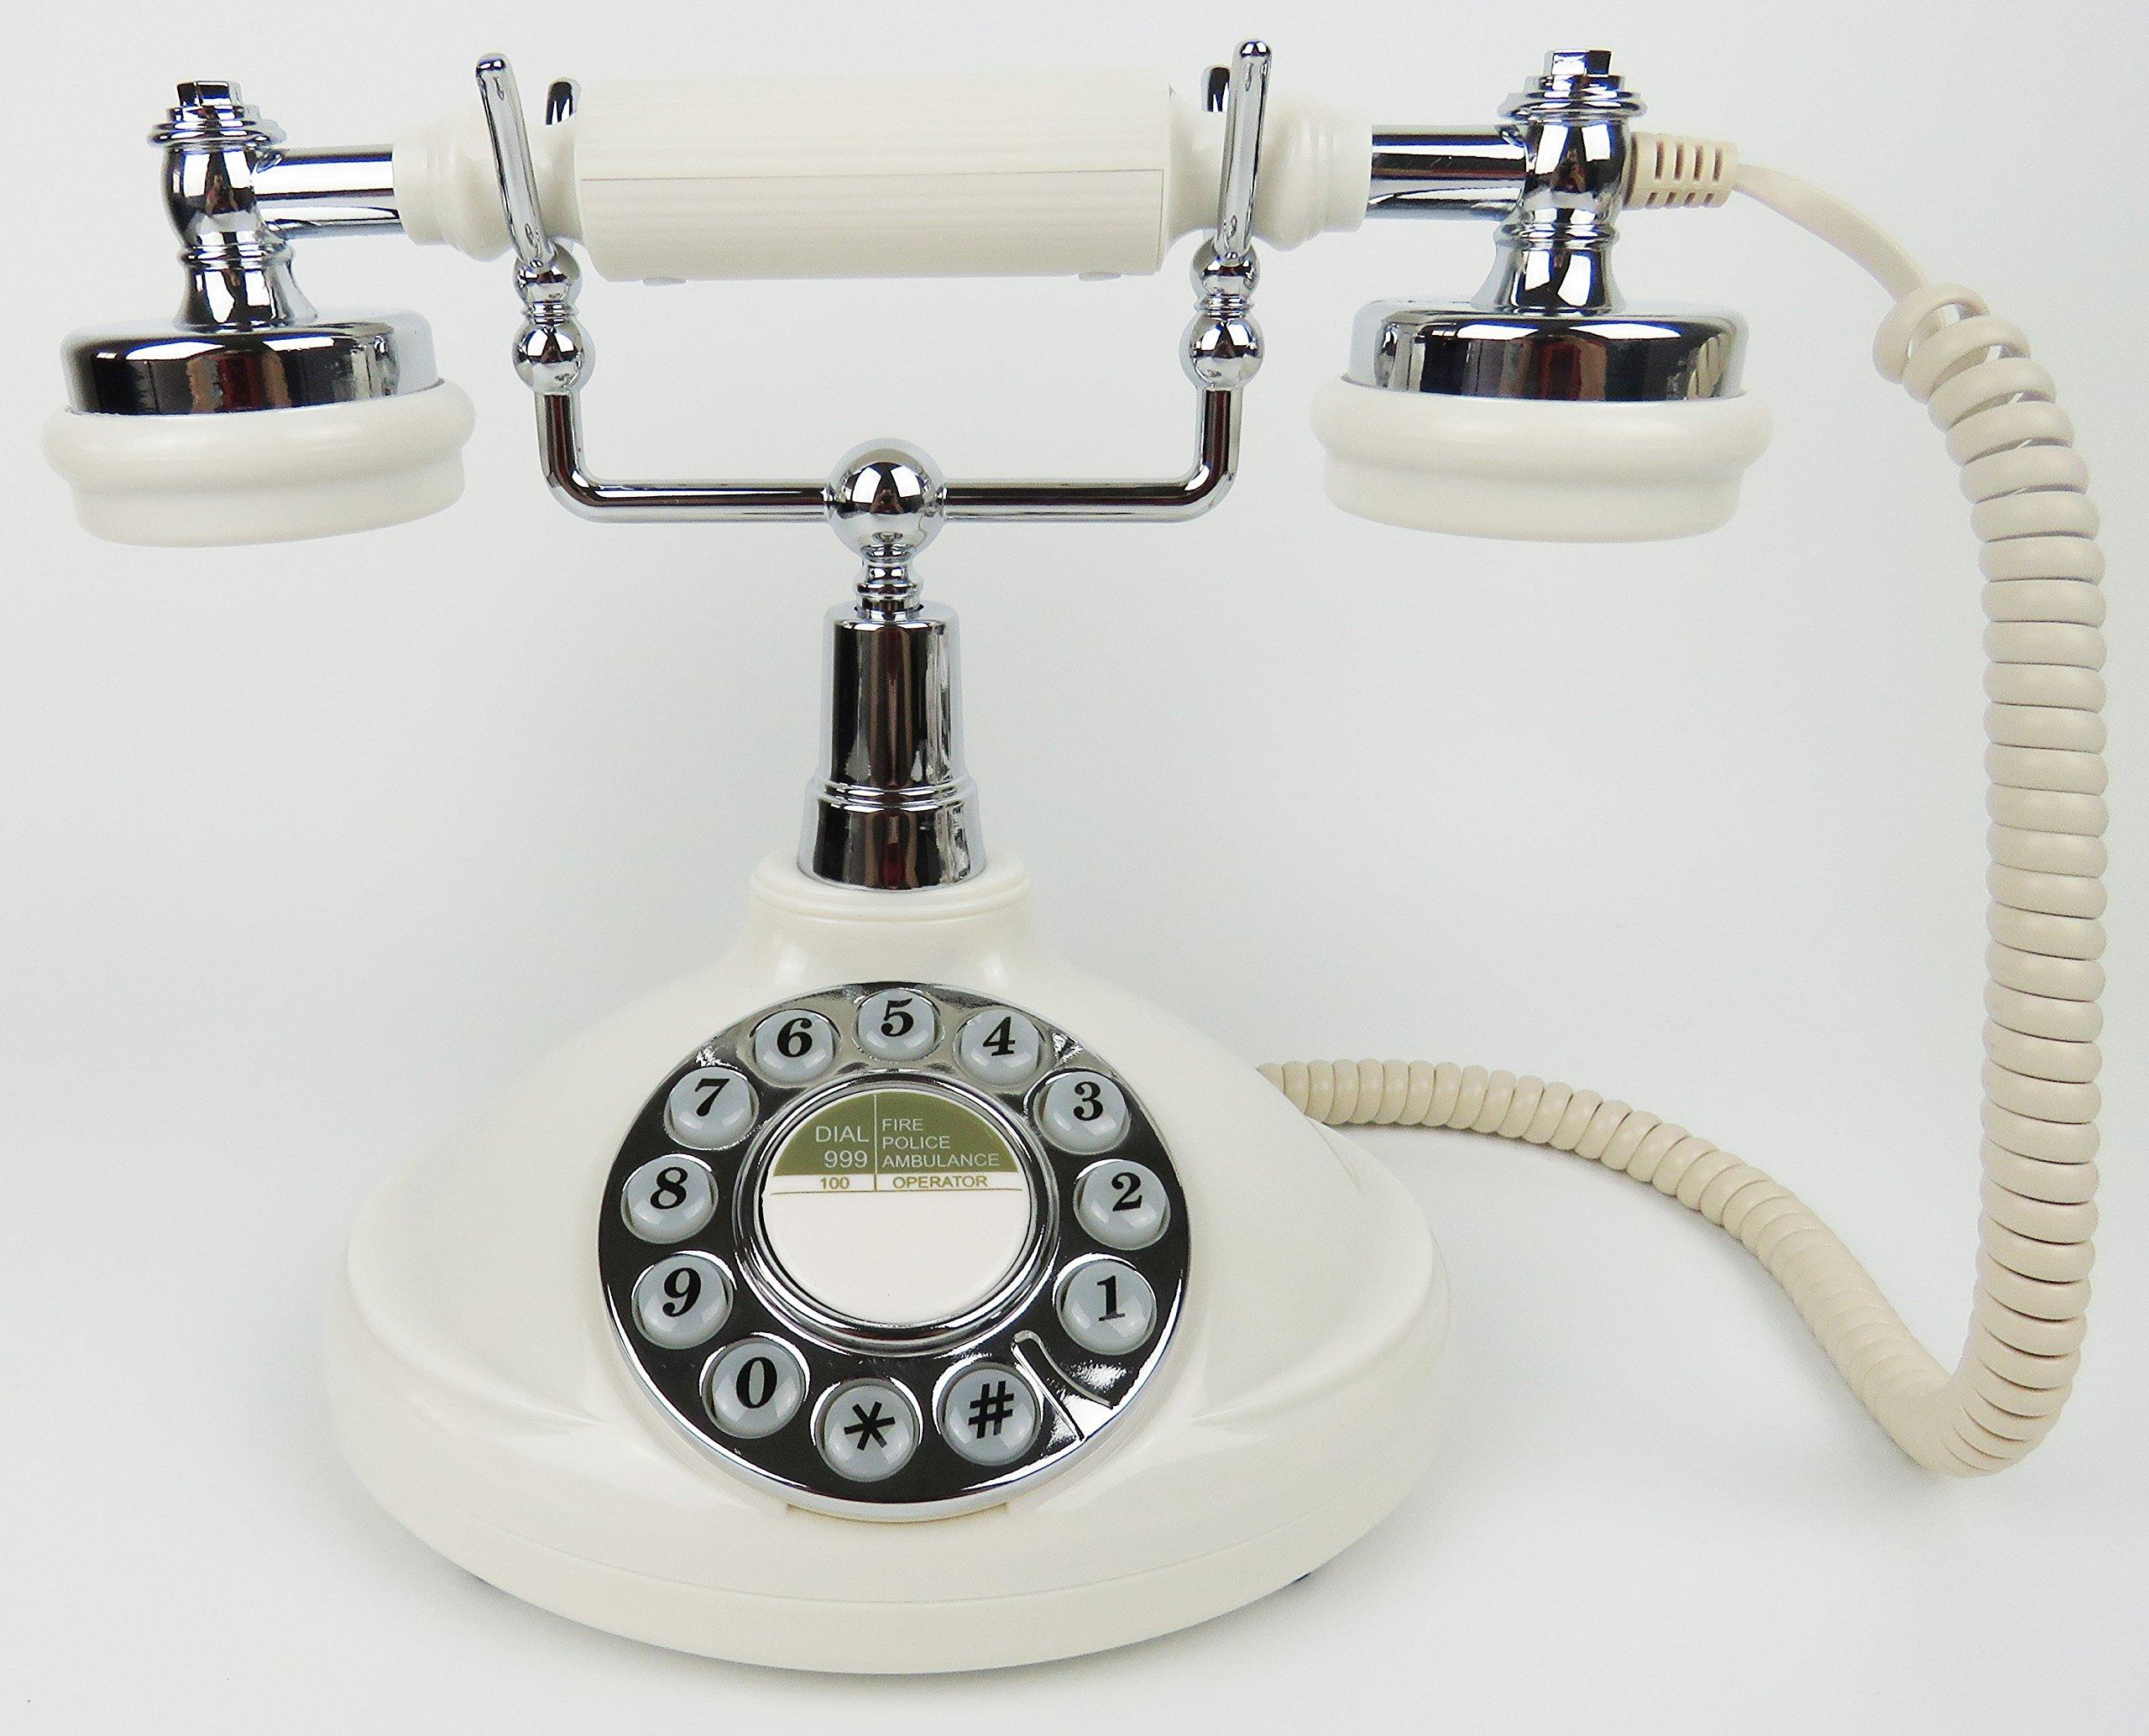 Home Creative Antique Telephone-Classic Desk Phone with Push Botton-1920